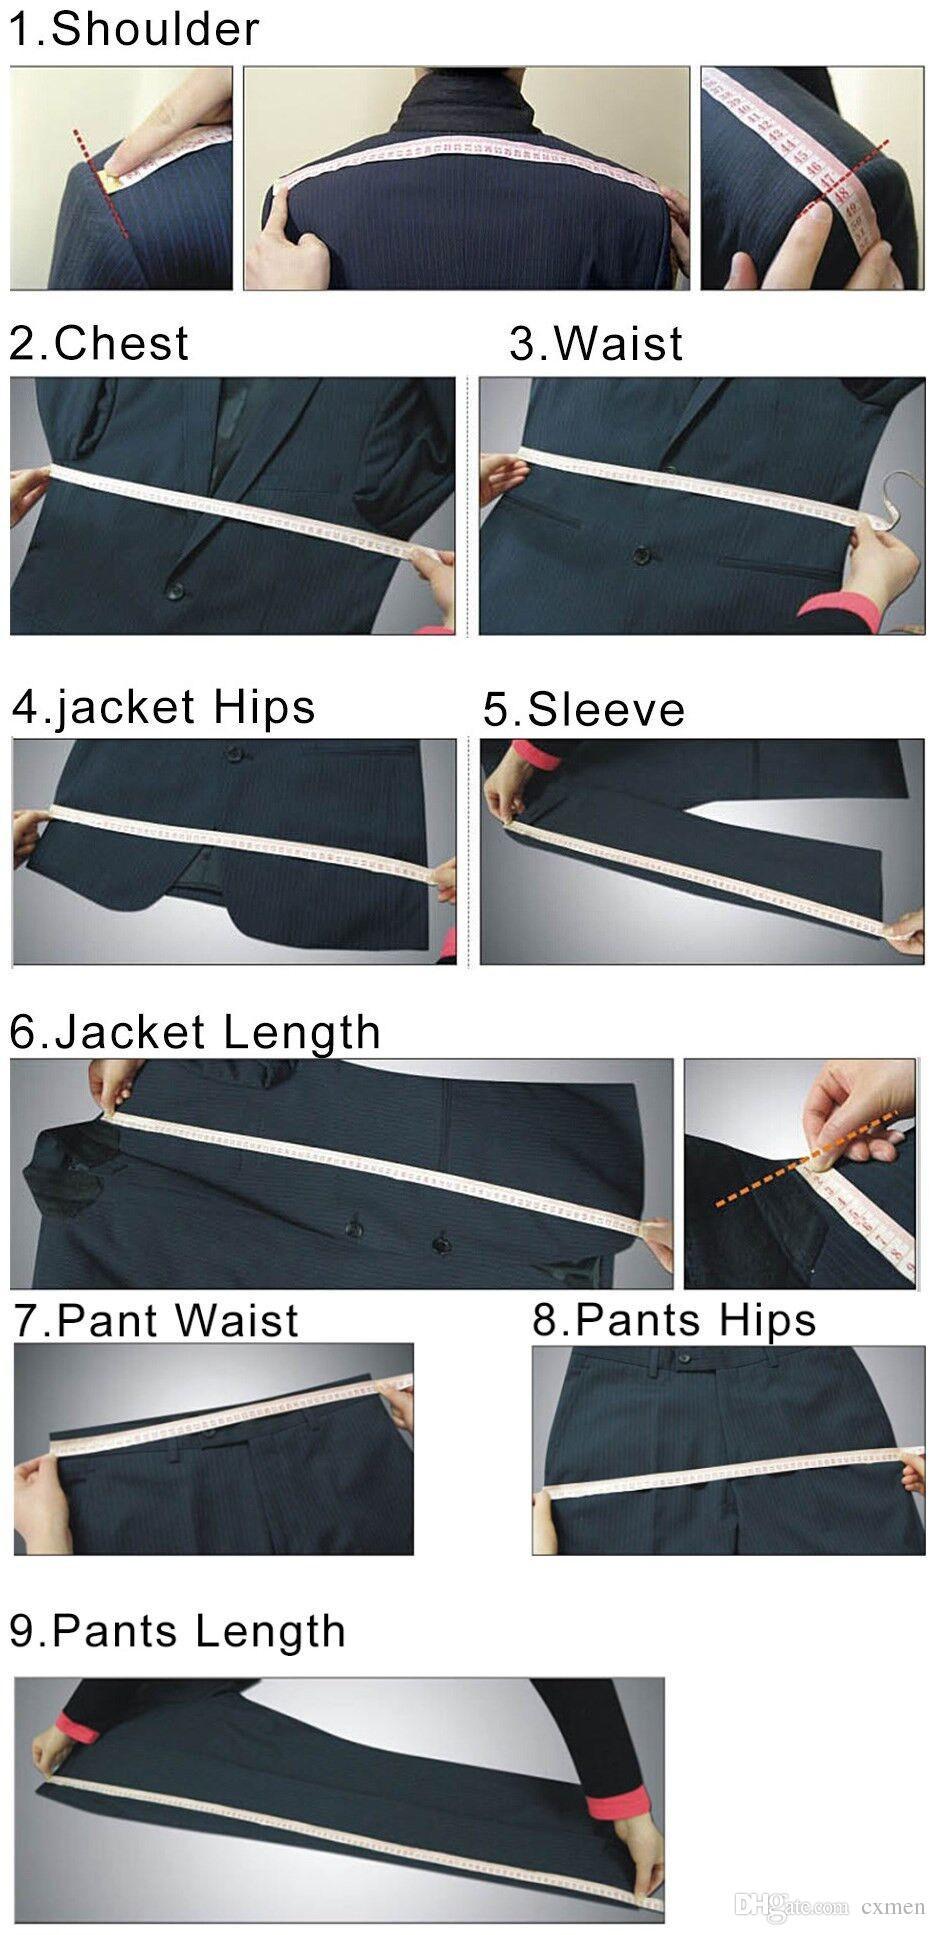 Custom Made Blue Slim Fit Men Suits 2018 Wedding Gray Summer Beach Suit With Short Pants Groom Wear TuxedosJacket+Pants